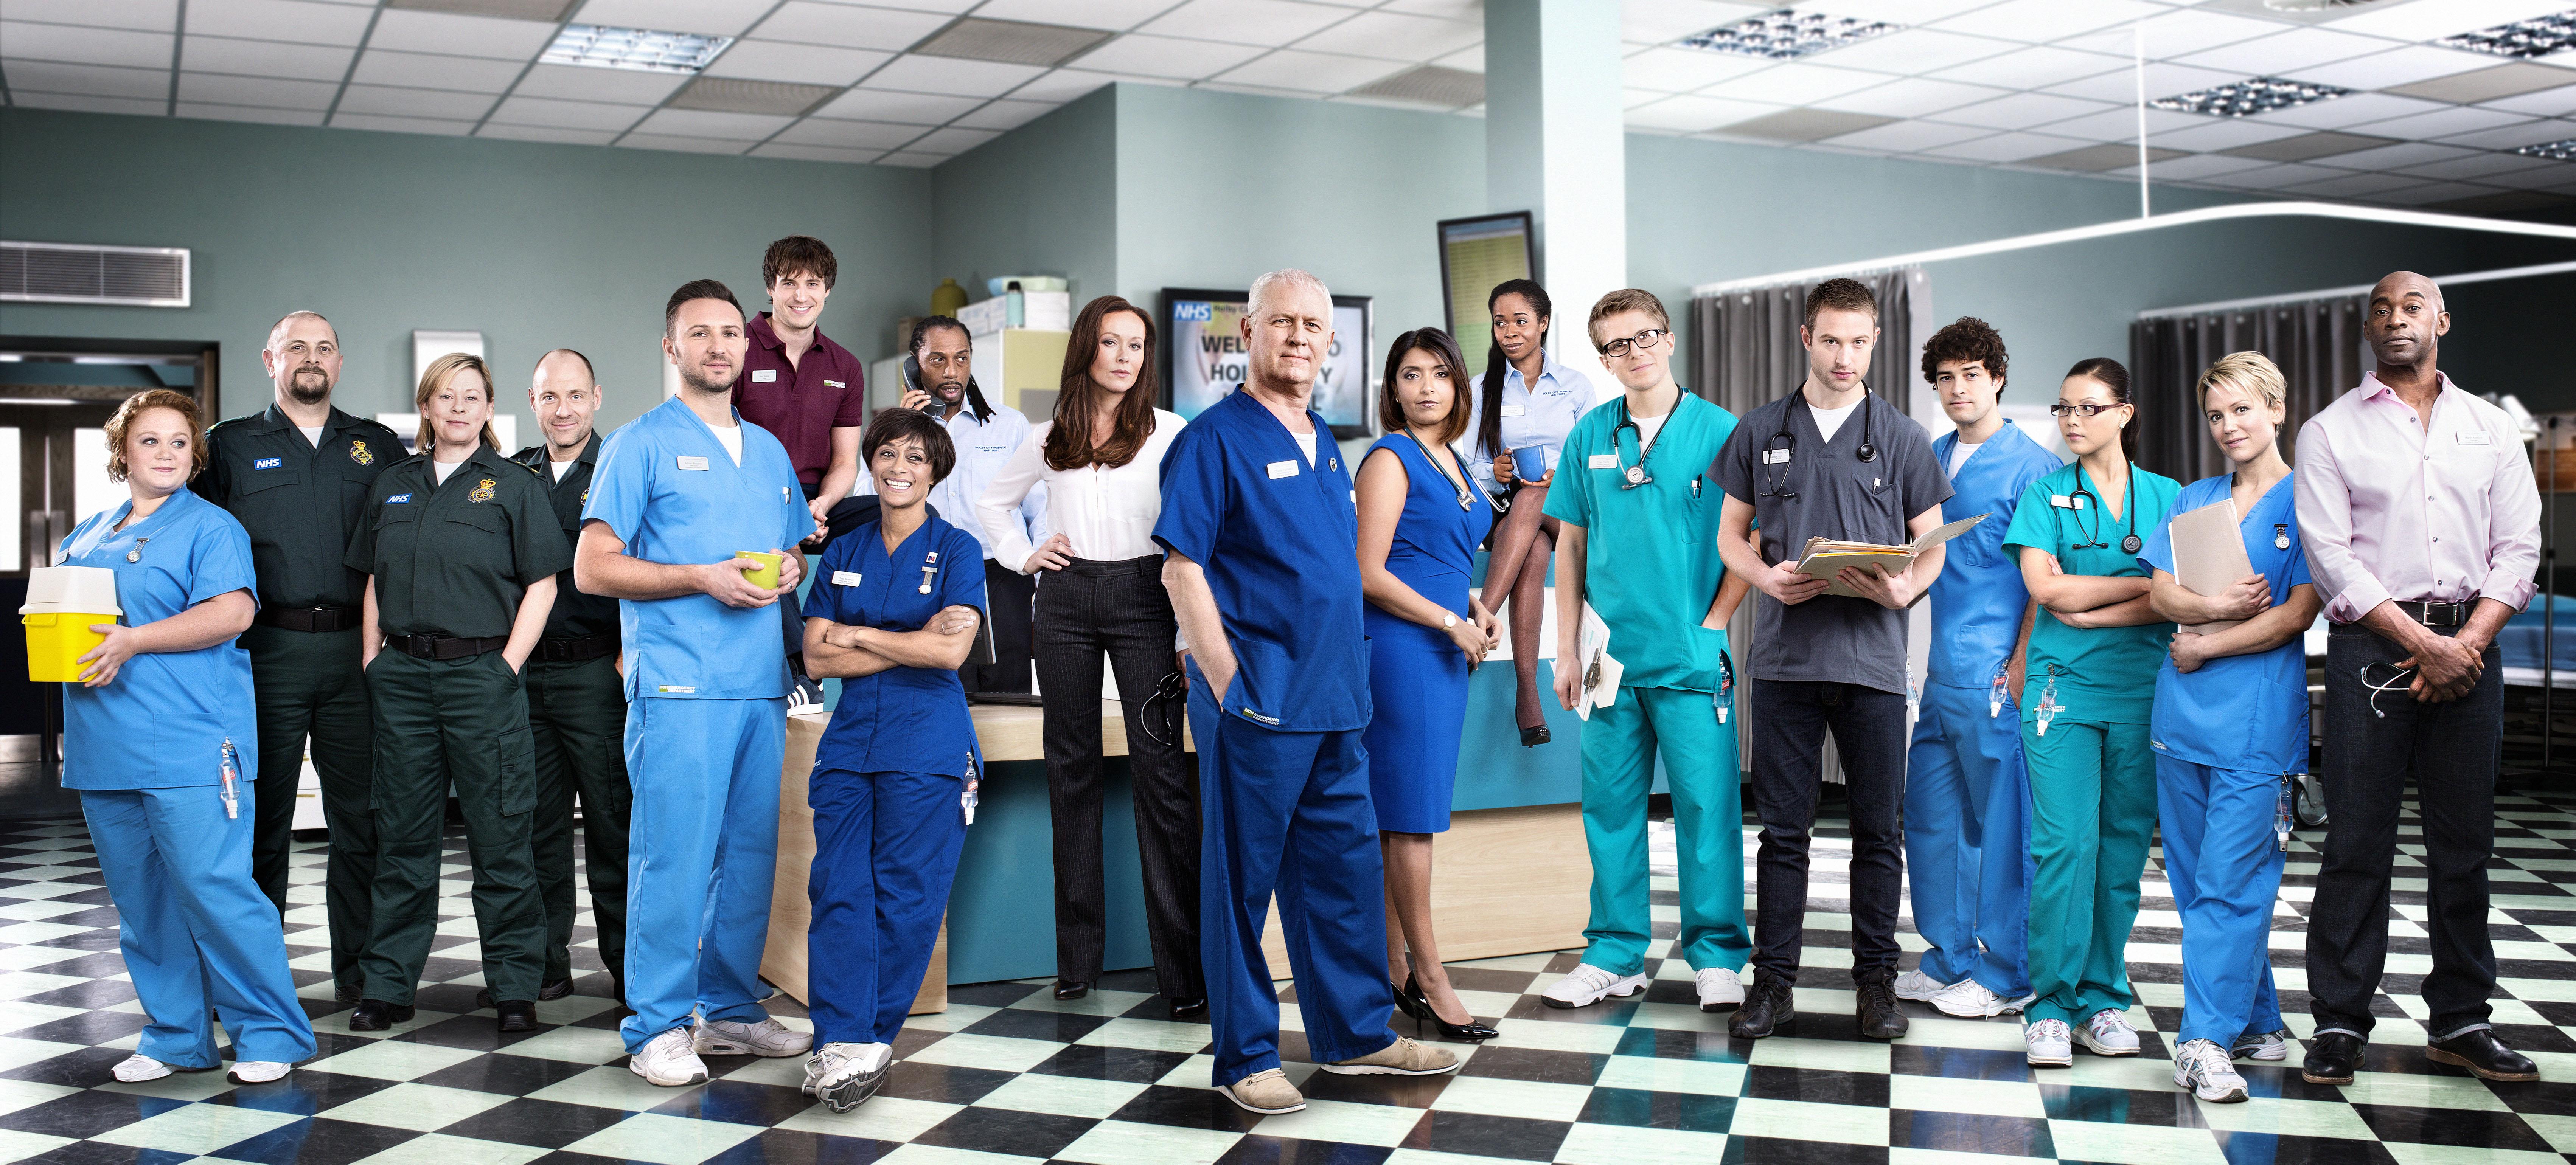 Casualty series 28 cast.jpg